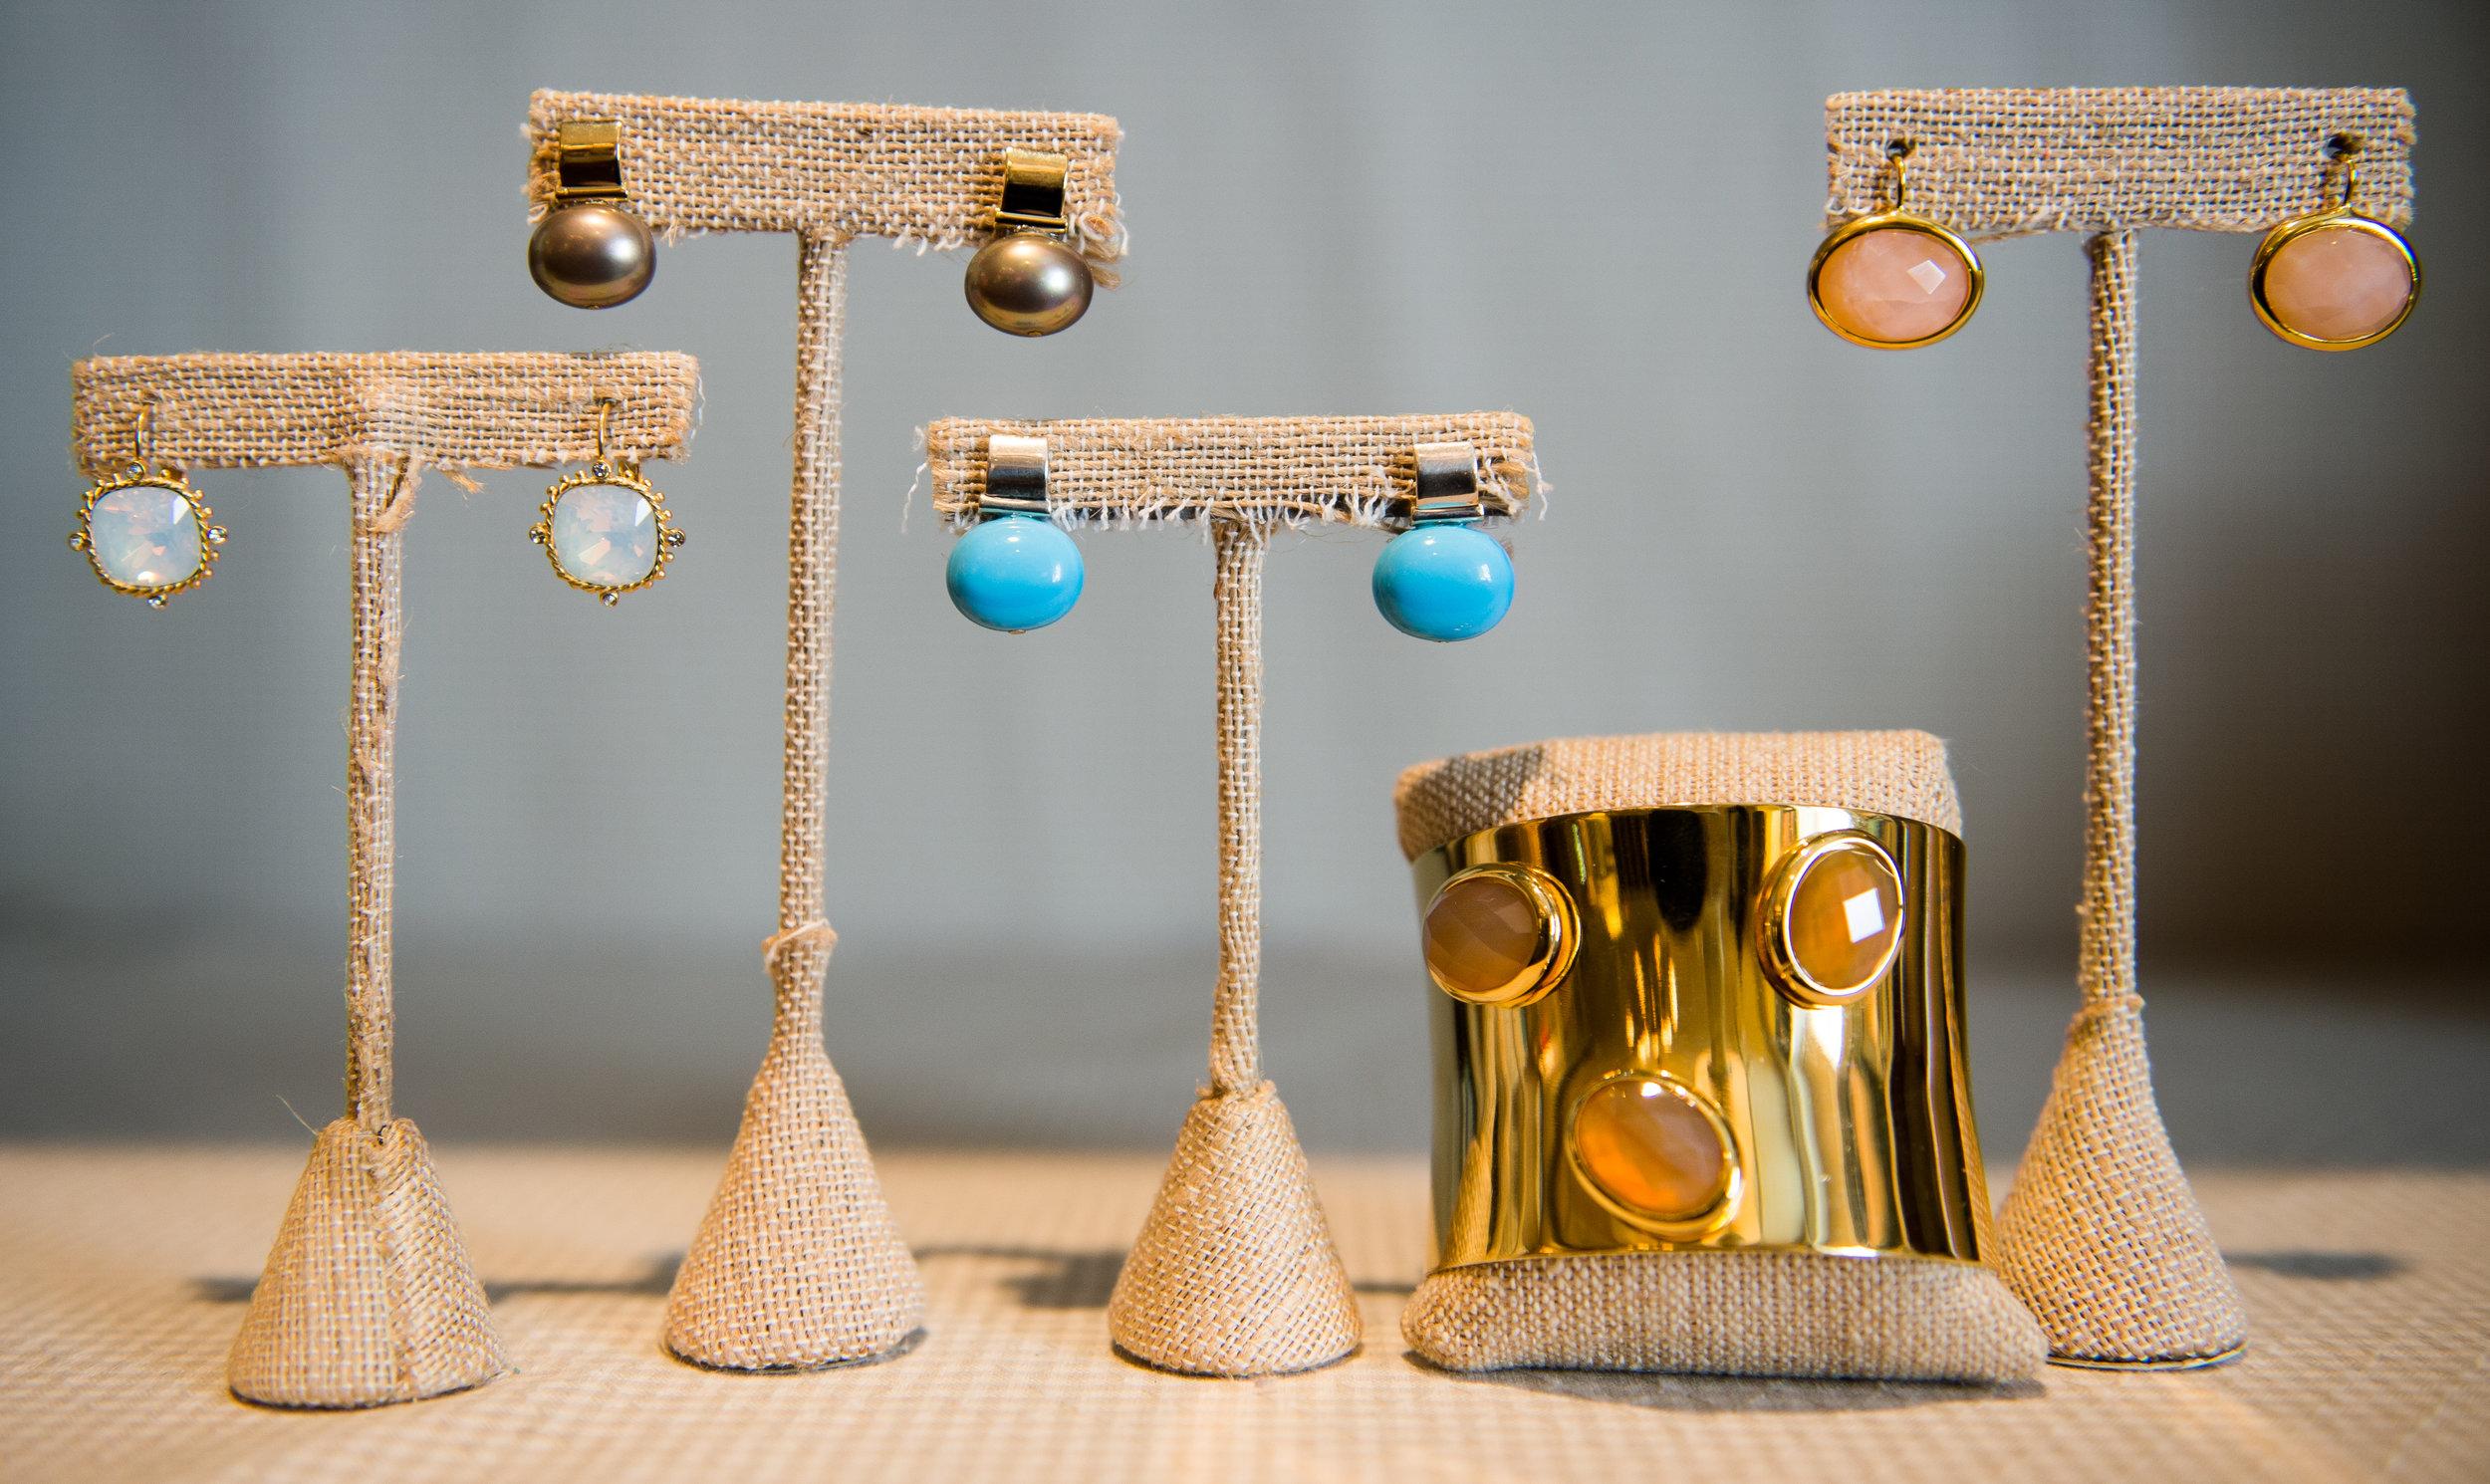 Earrings at gift shop, Atlanta, GA